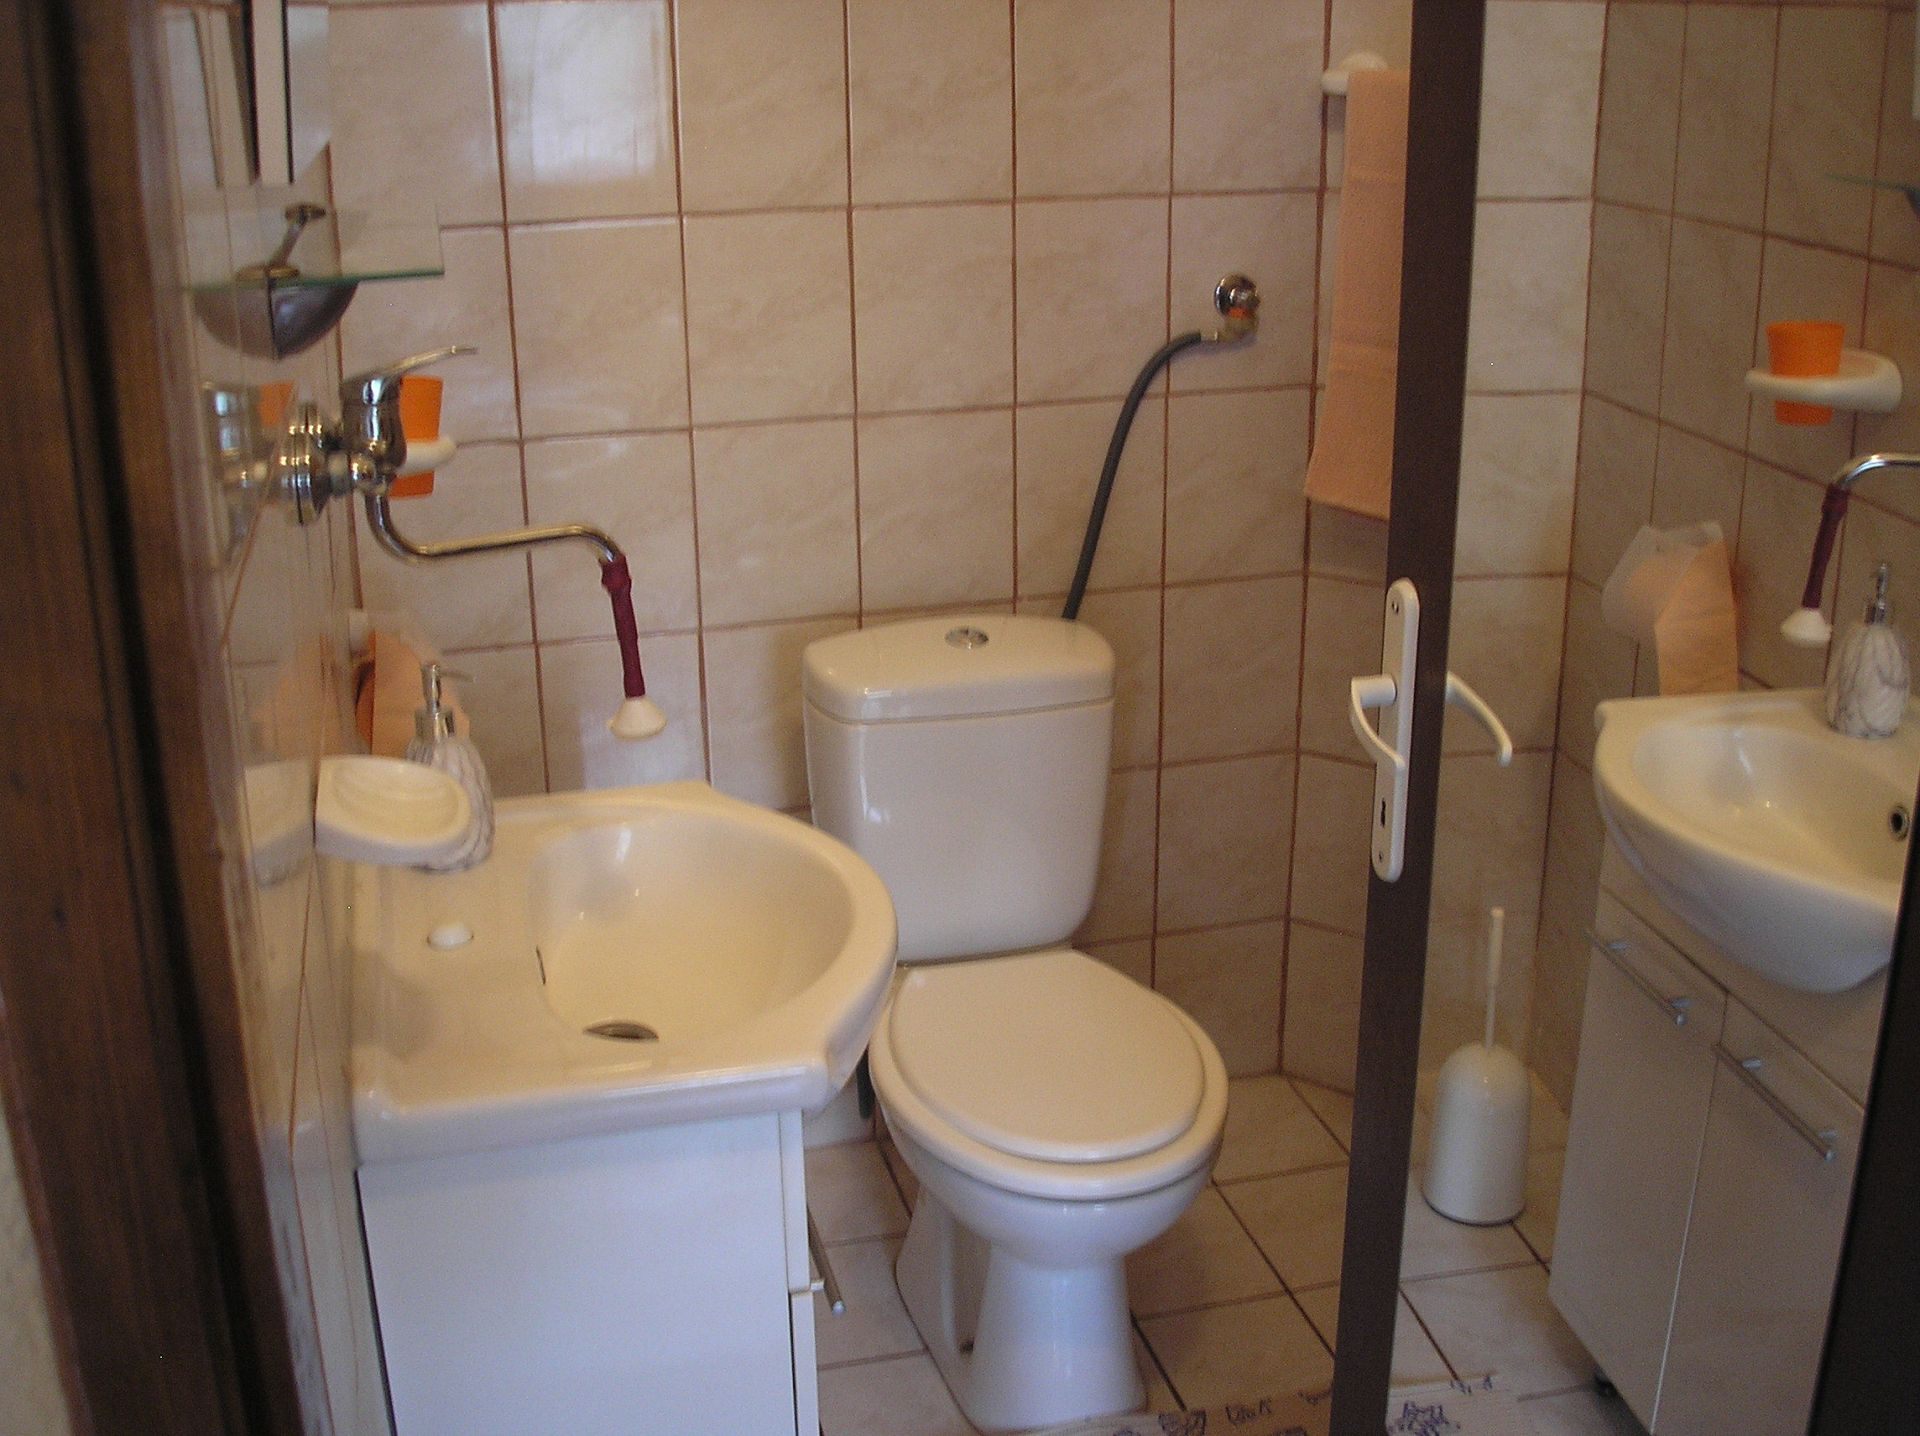 Apartment Room Zvonkic R4 Aljmas, Continental Croatia 51946, Aljmaš, , Osjecko Baranjska